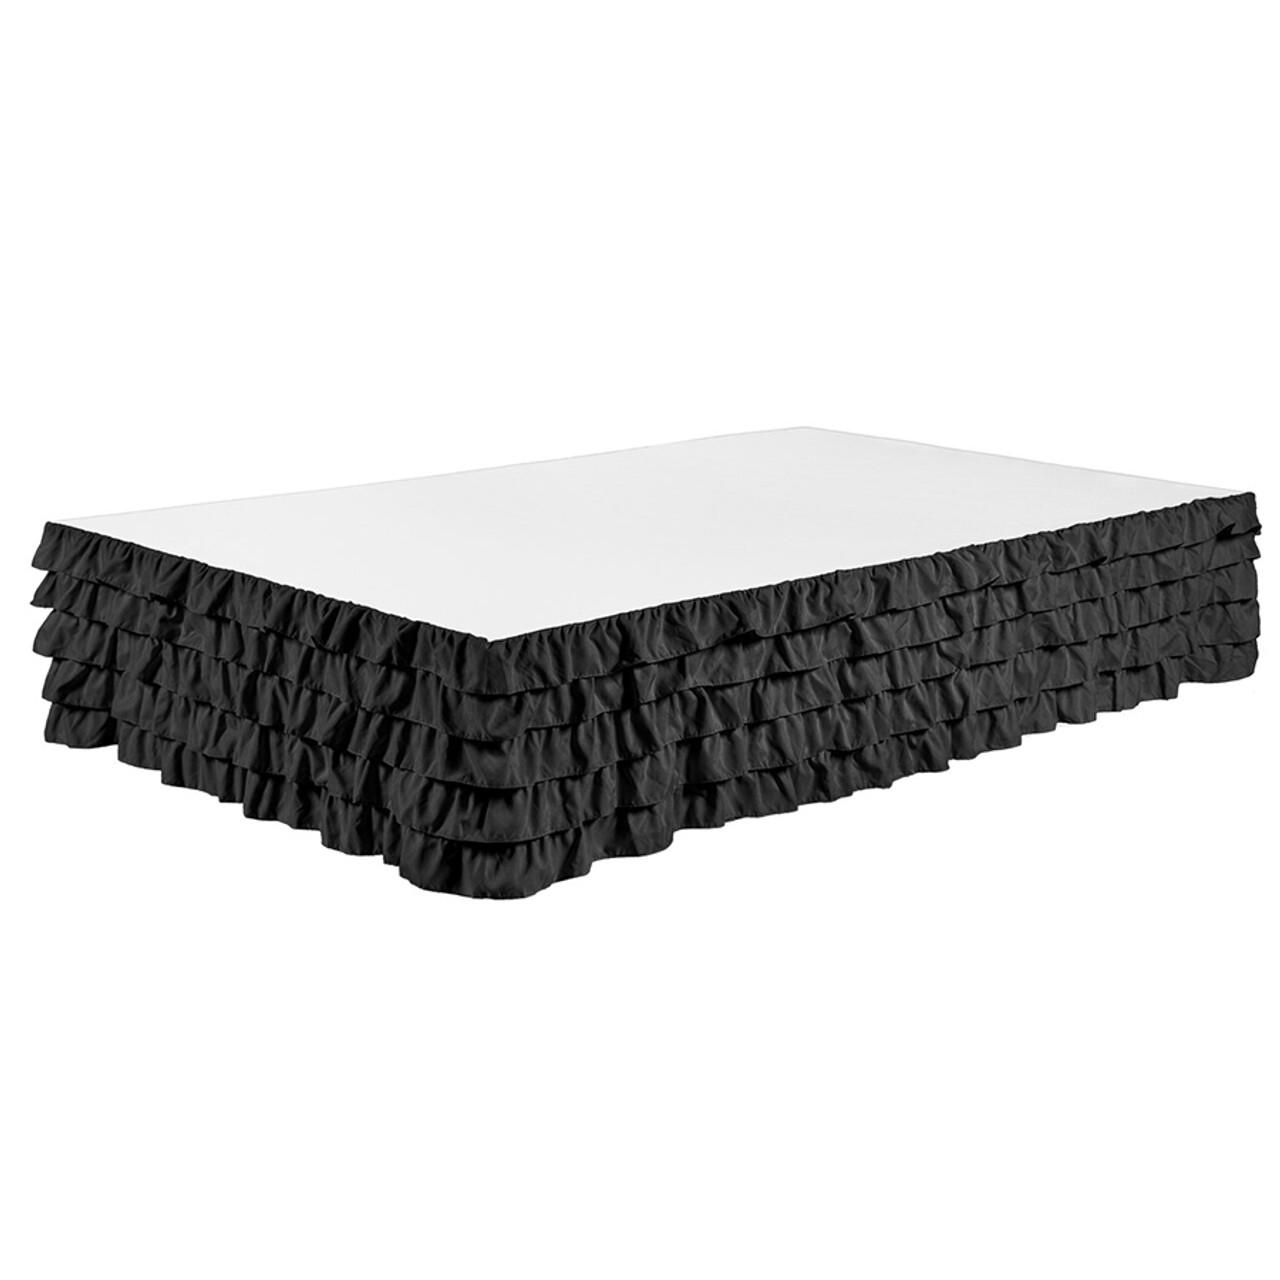 "Black Bed Skirt Tiered Dust Ruffle 100% Brushed Microfiber with 14"" Drop in USA, California, New York, New York City, Los Angeles, San Francisco, Pennsylvania, Washington DC, Virginia, Maryland"